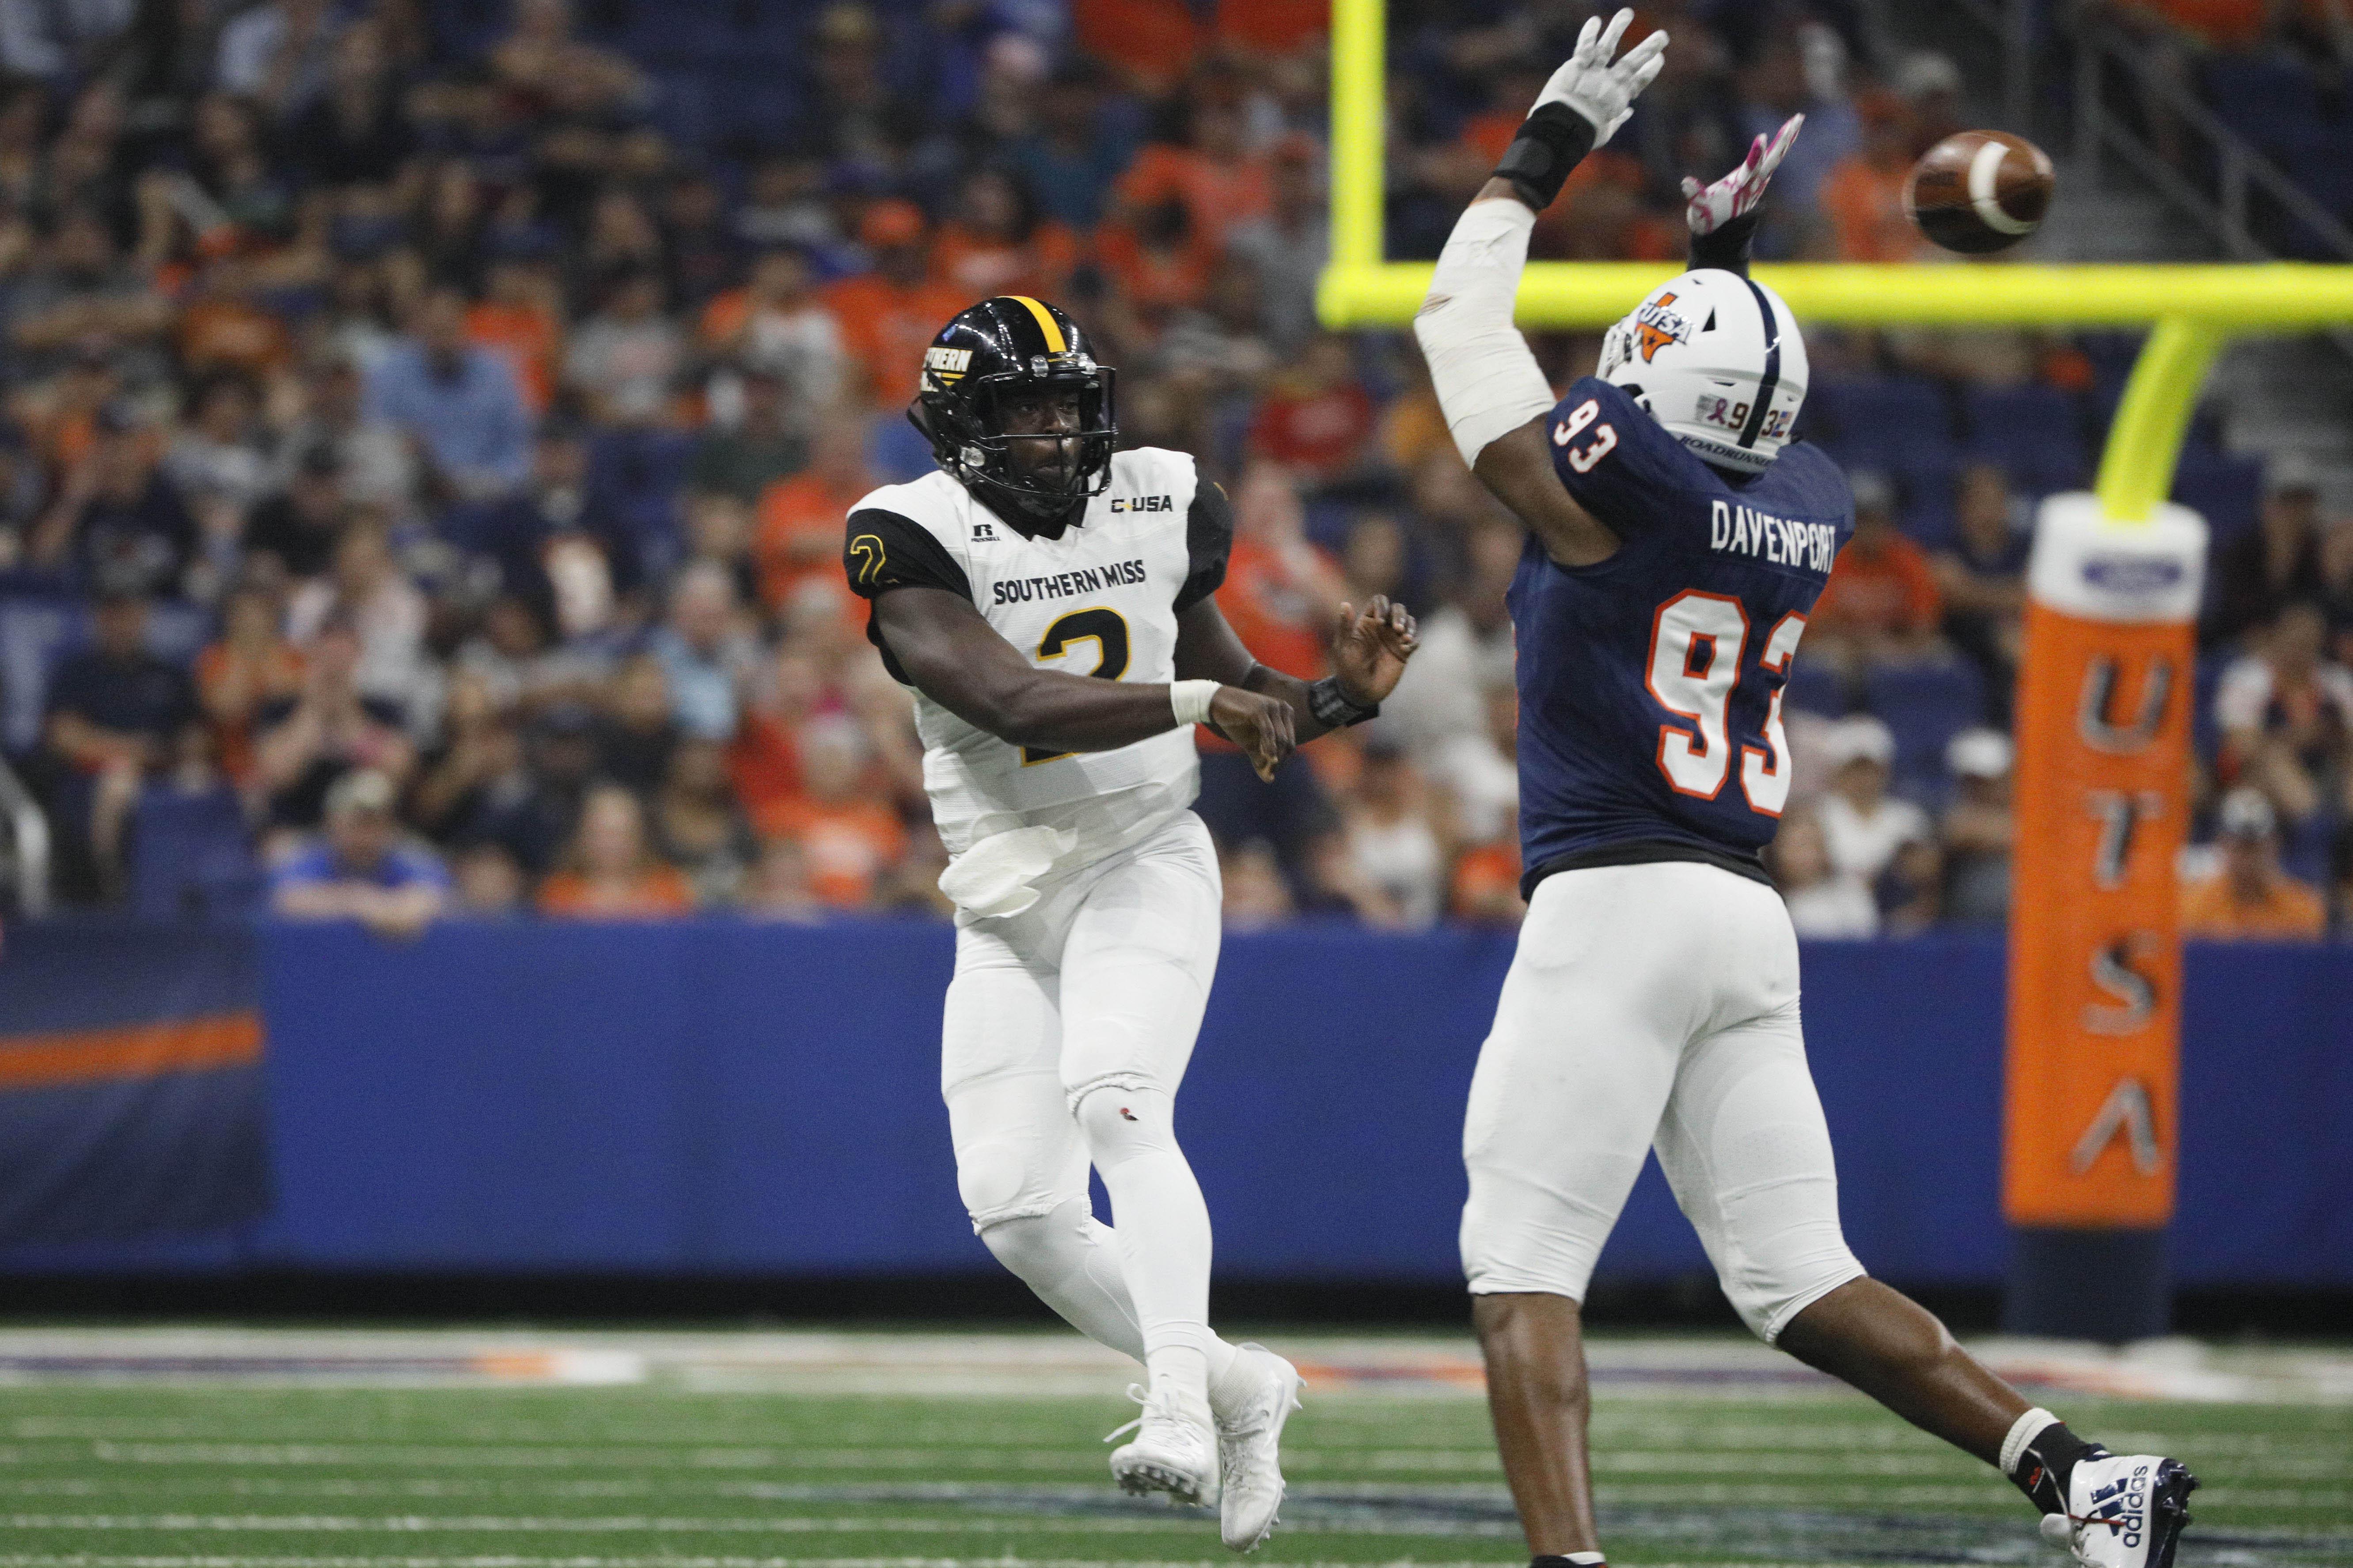 Texas-San Antonio DE Marcus Davenport pressures Southern Mississippi QB Keon Howard